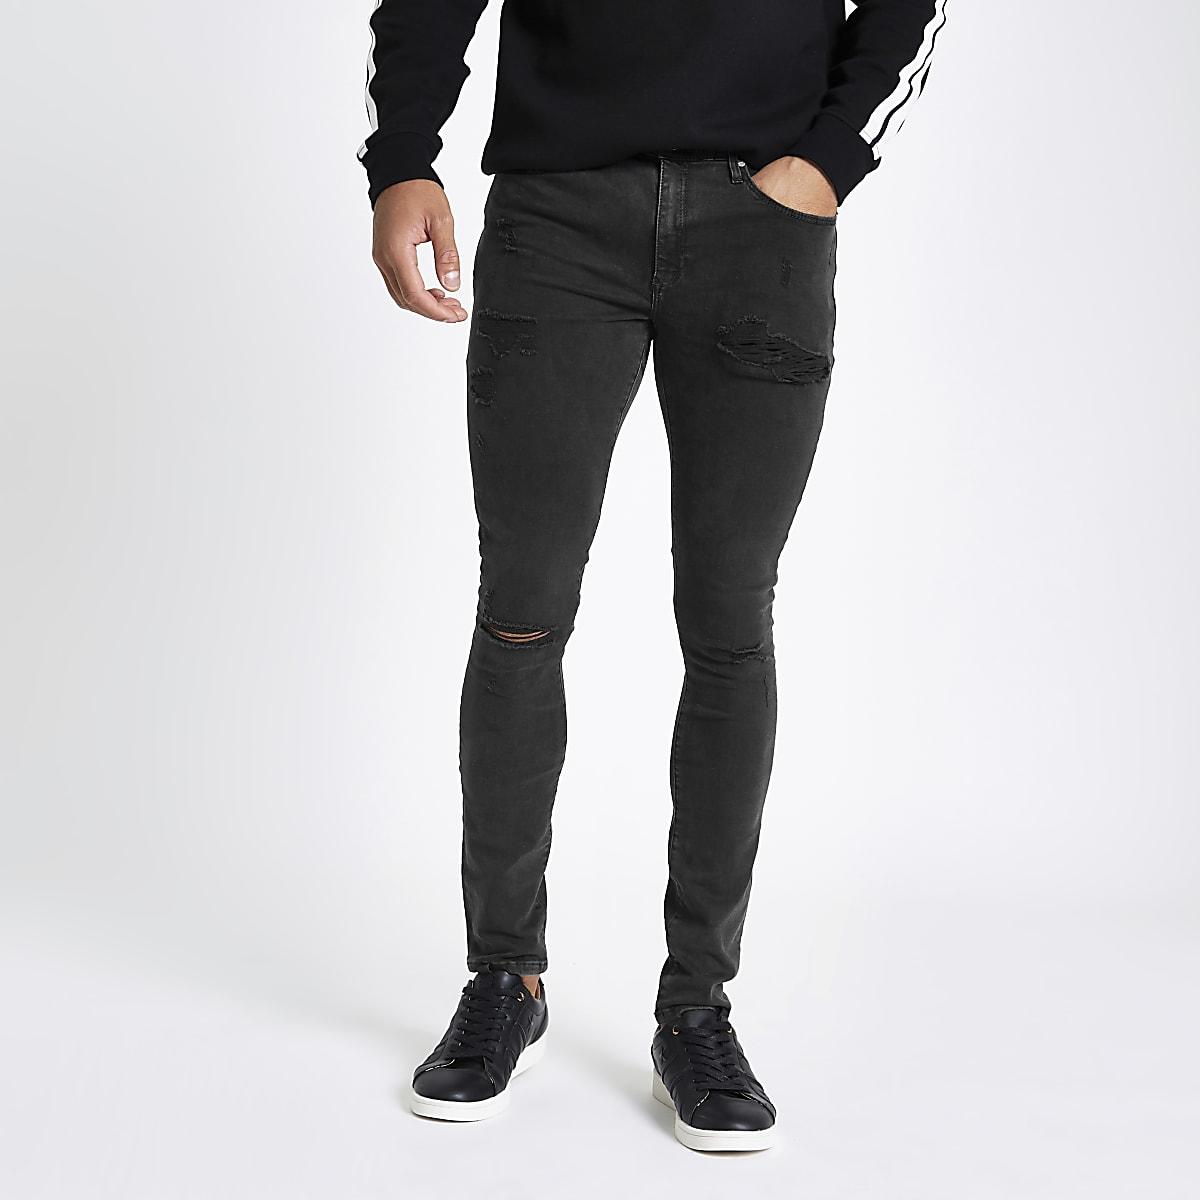 Danny – Schwarze Super Skinny Spray-on-Jeans